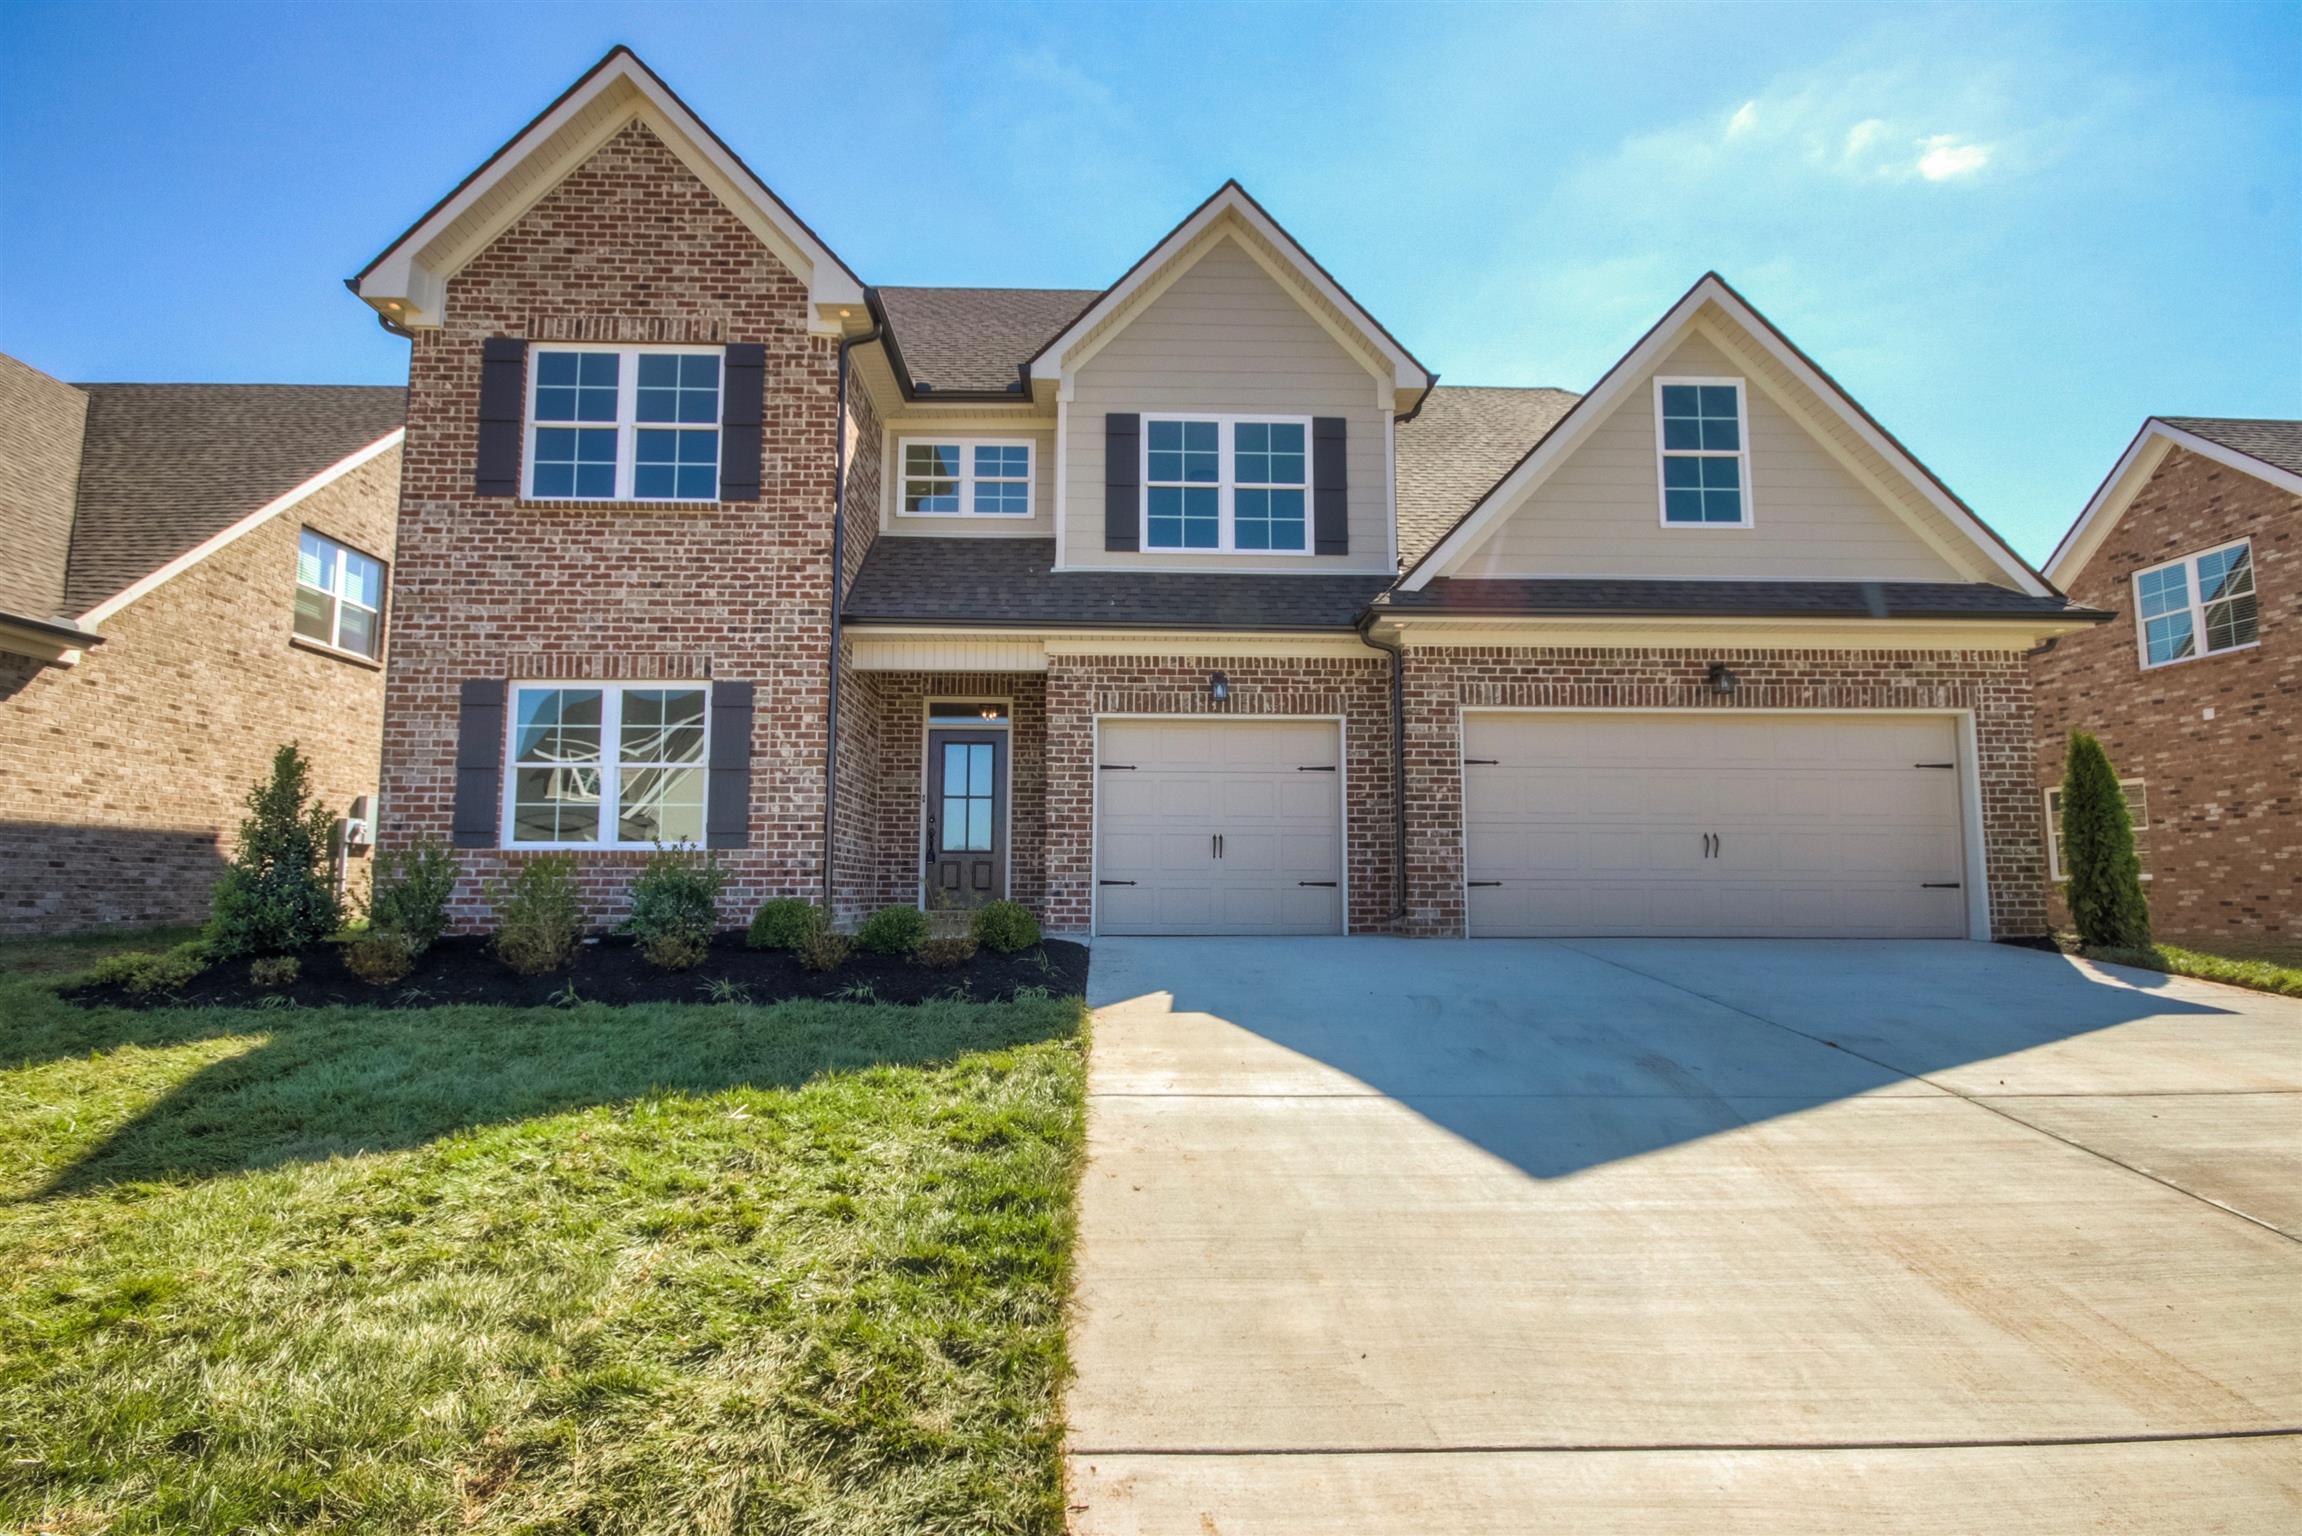 3932 Runyan Cove (Lot 48), Murfreesboro, TN 37127 - Murfreesboro, TN real estate listing